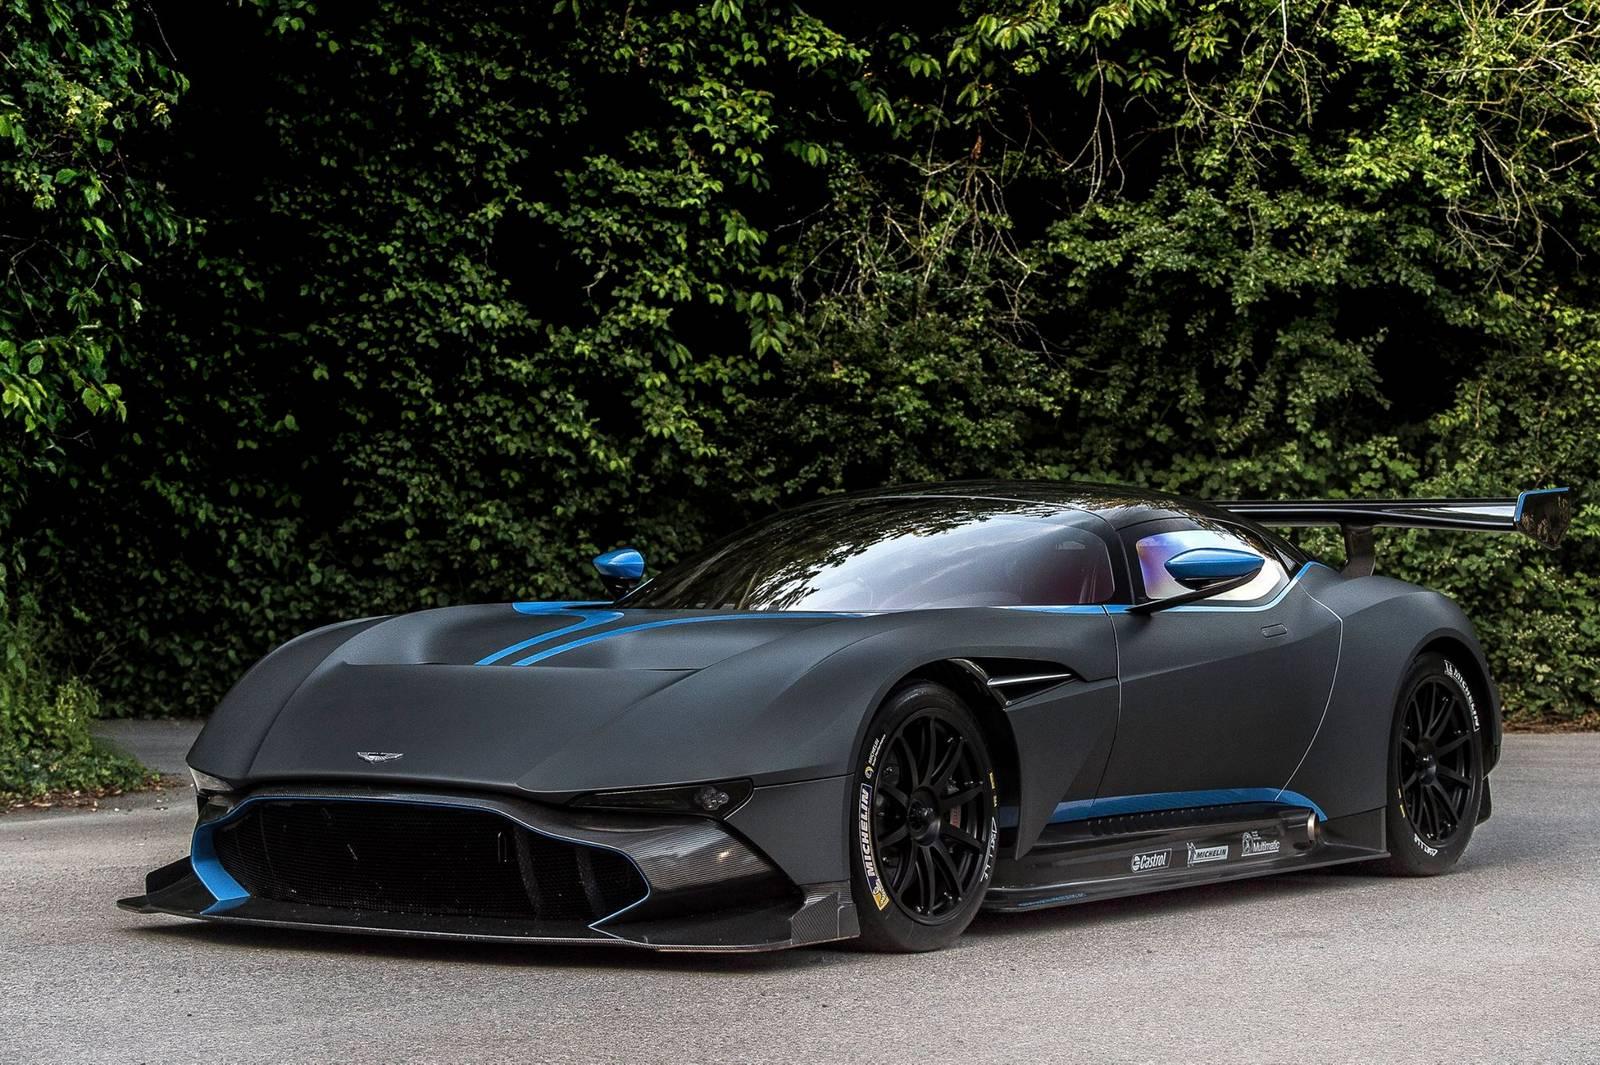 Goodwood Black Aston Martin Vulcan GTspirit - Black aston martin